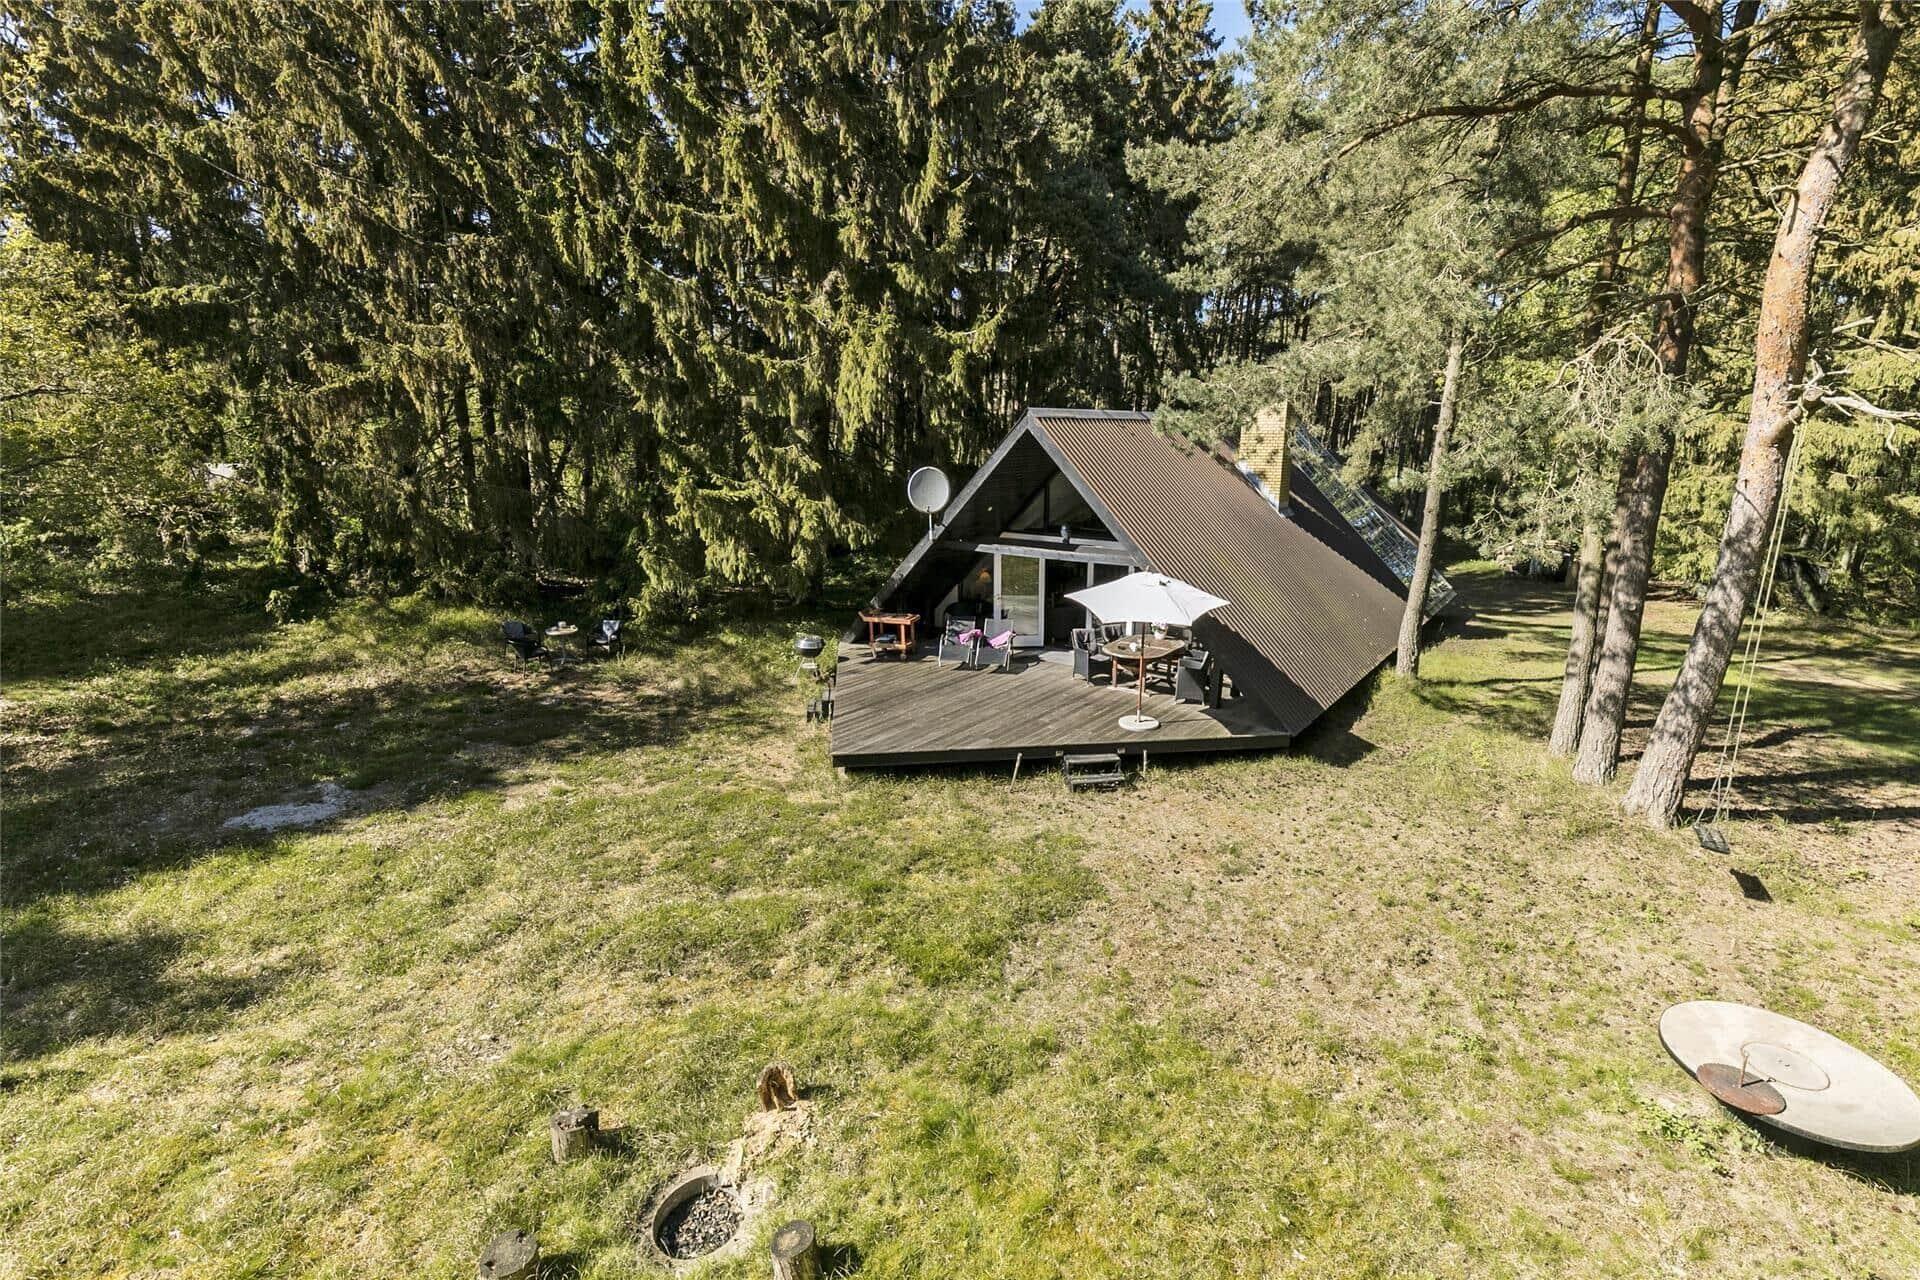 Billede 1-10 Sommerhus 1413, Vestre Sømarksvej 23, DK - 3720 Aakirkeby